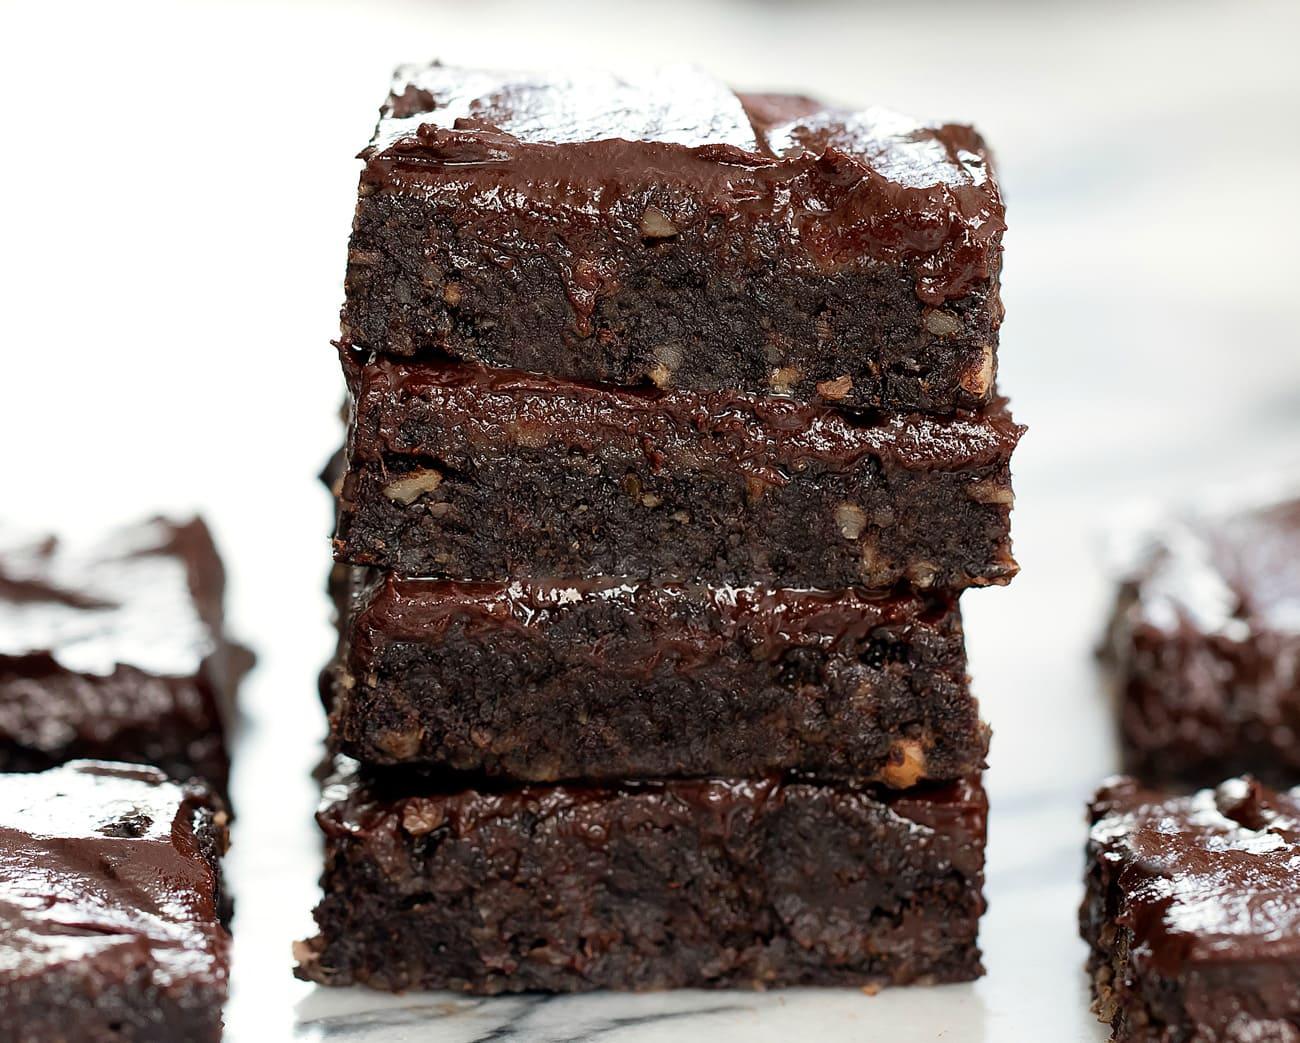 3 Ingredient No Bake Healthy Brownies (No Flour, Eggs, or Refined Sugar)